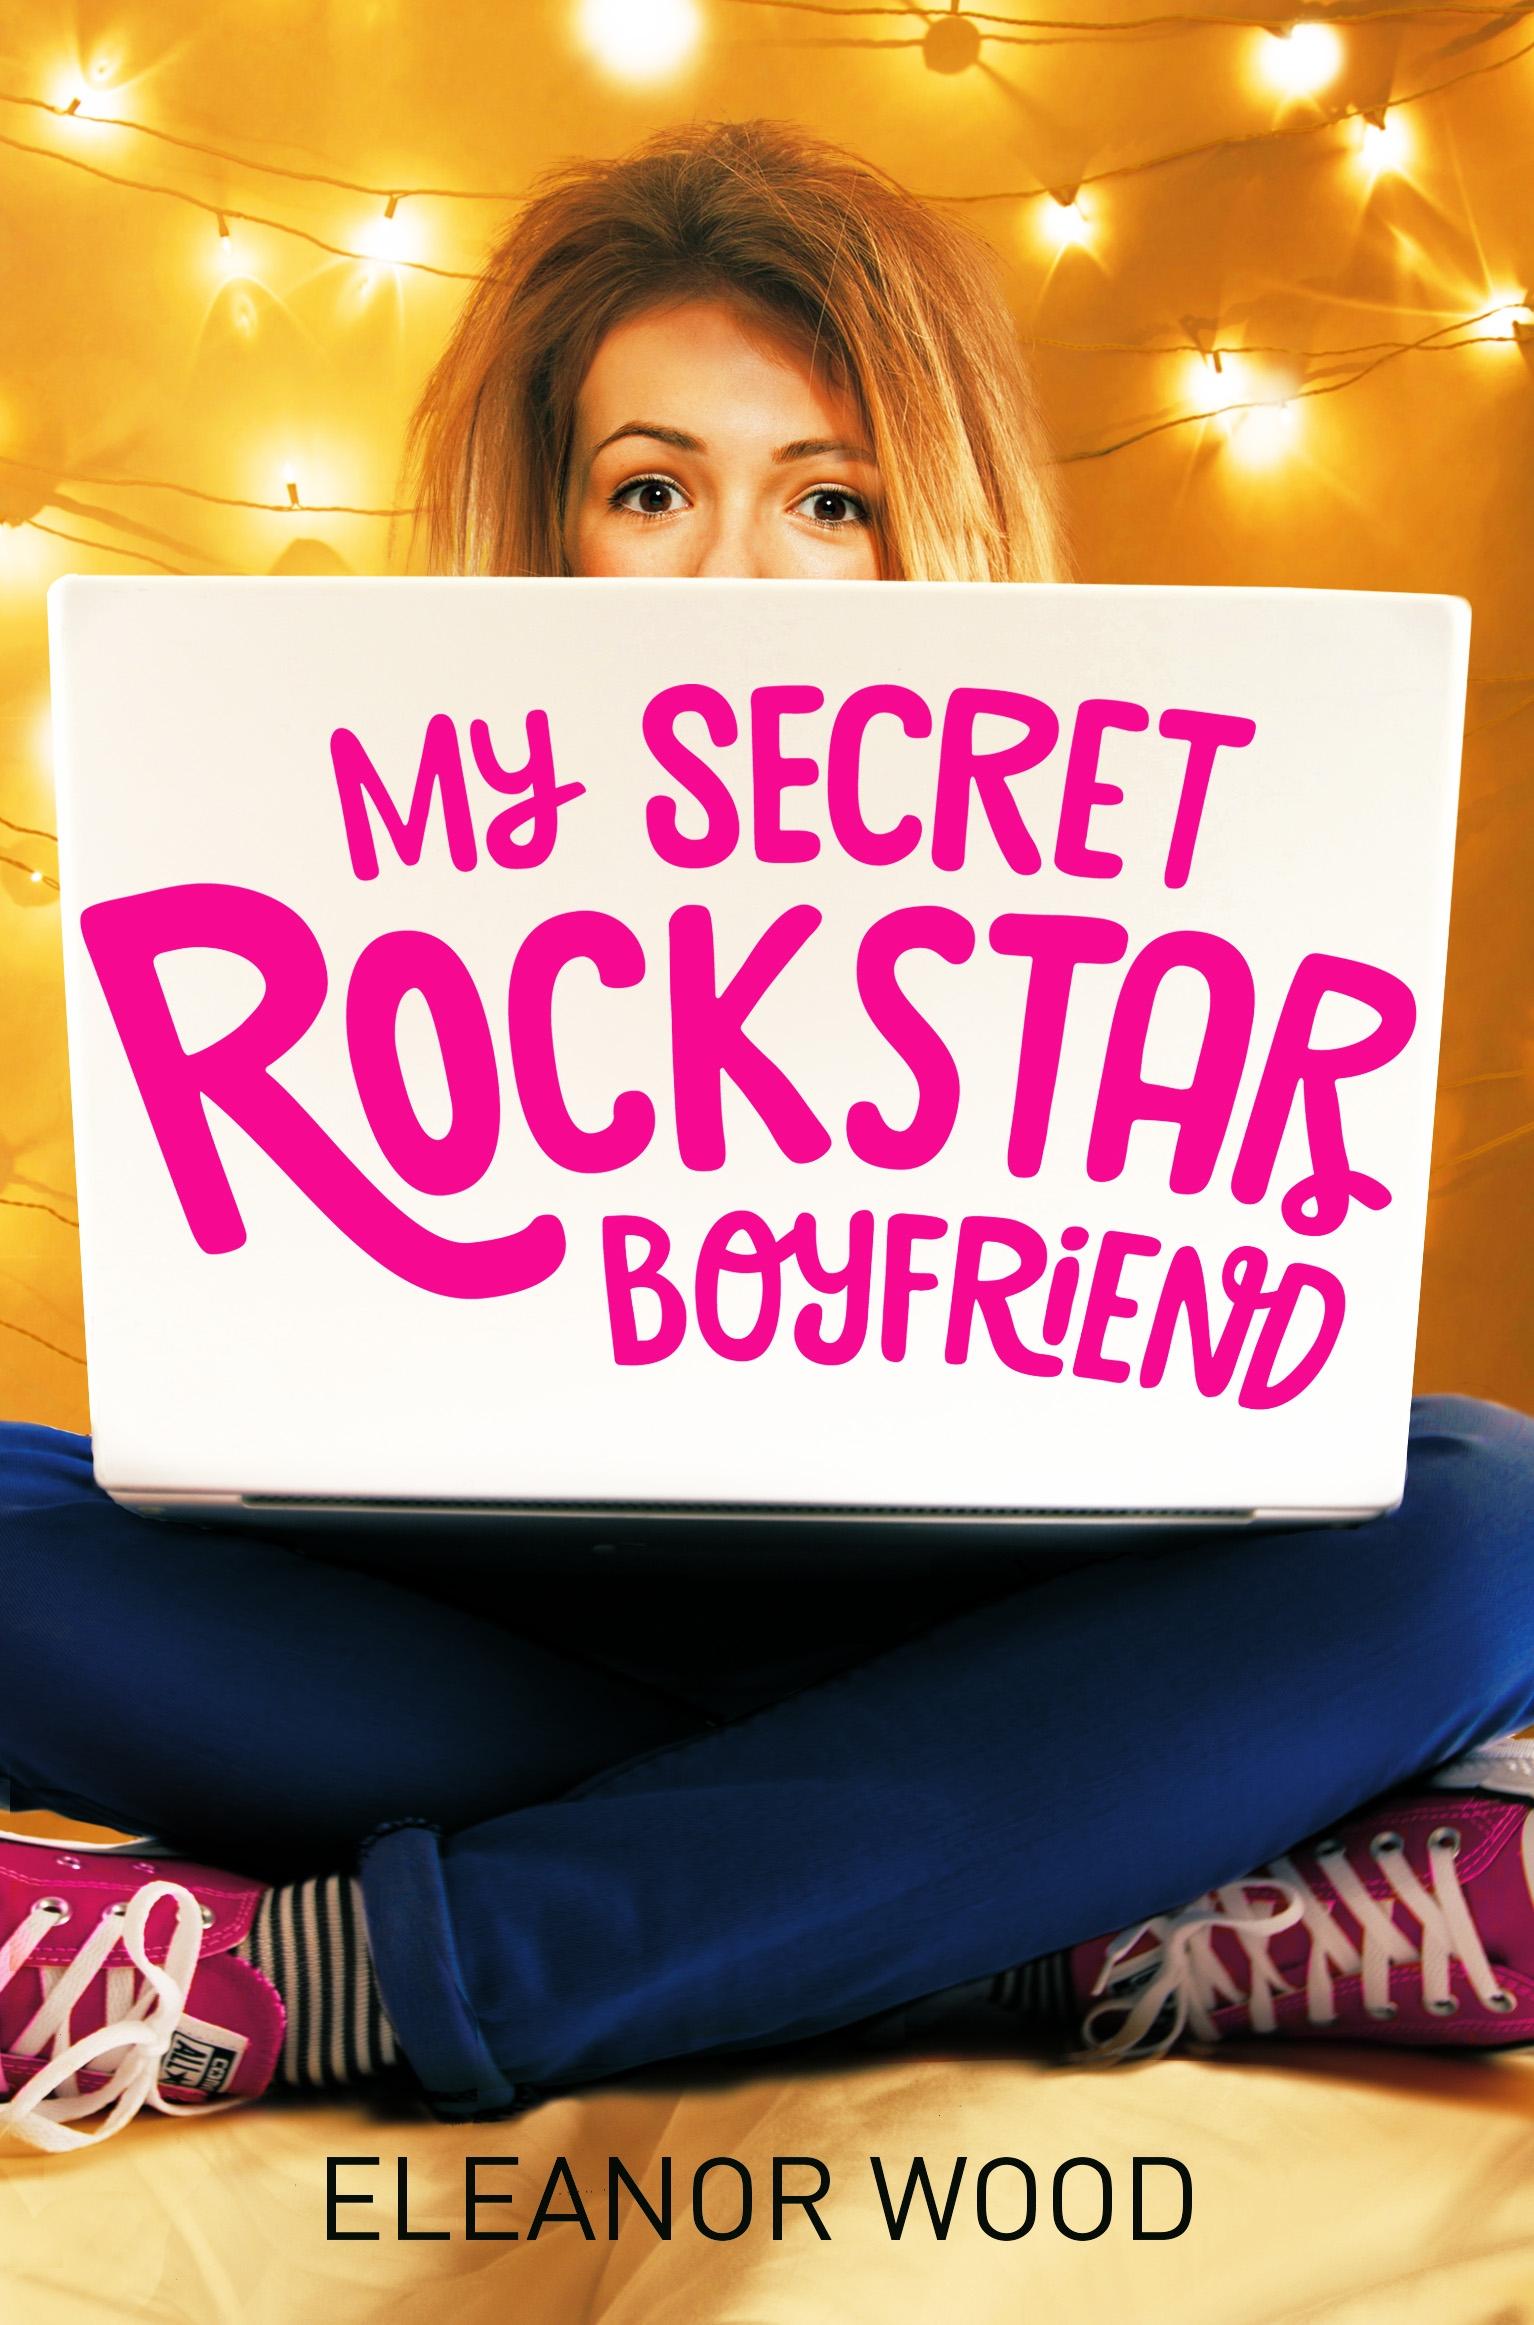 My Secret Rockstar Boyfriend review